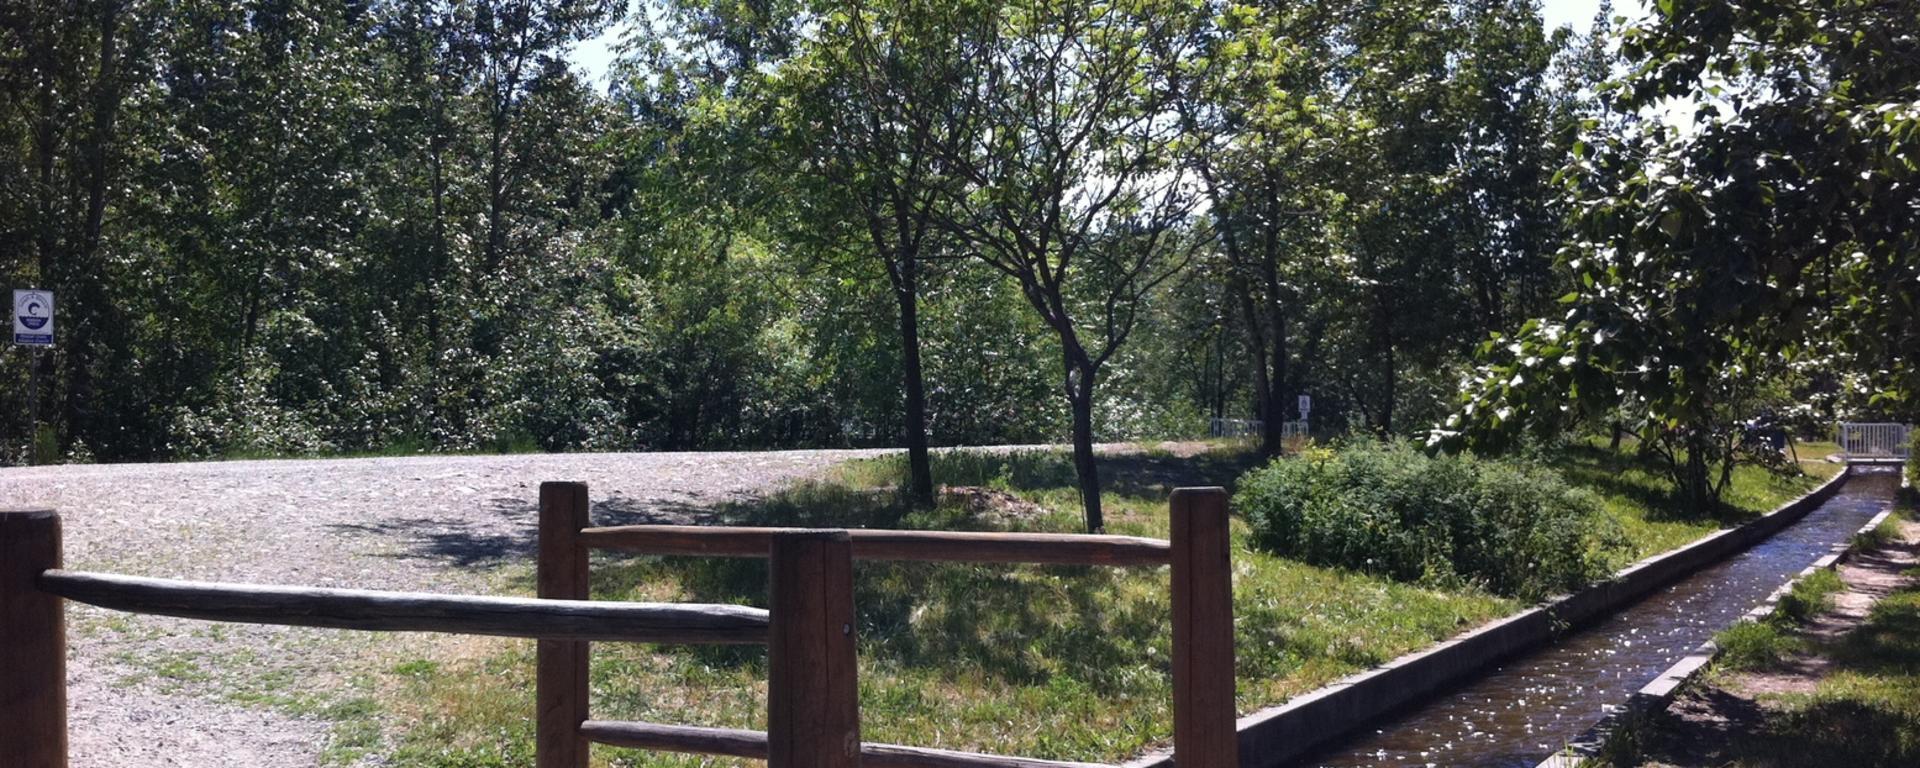 Mission Creek Regional Park 1